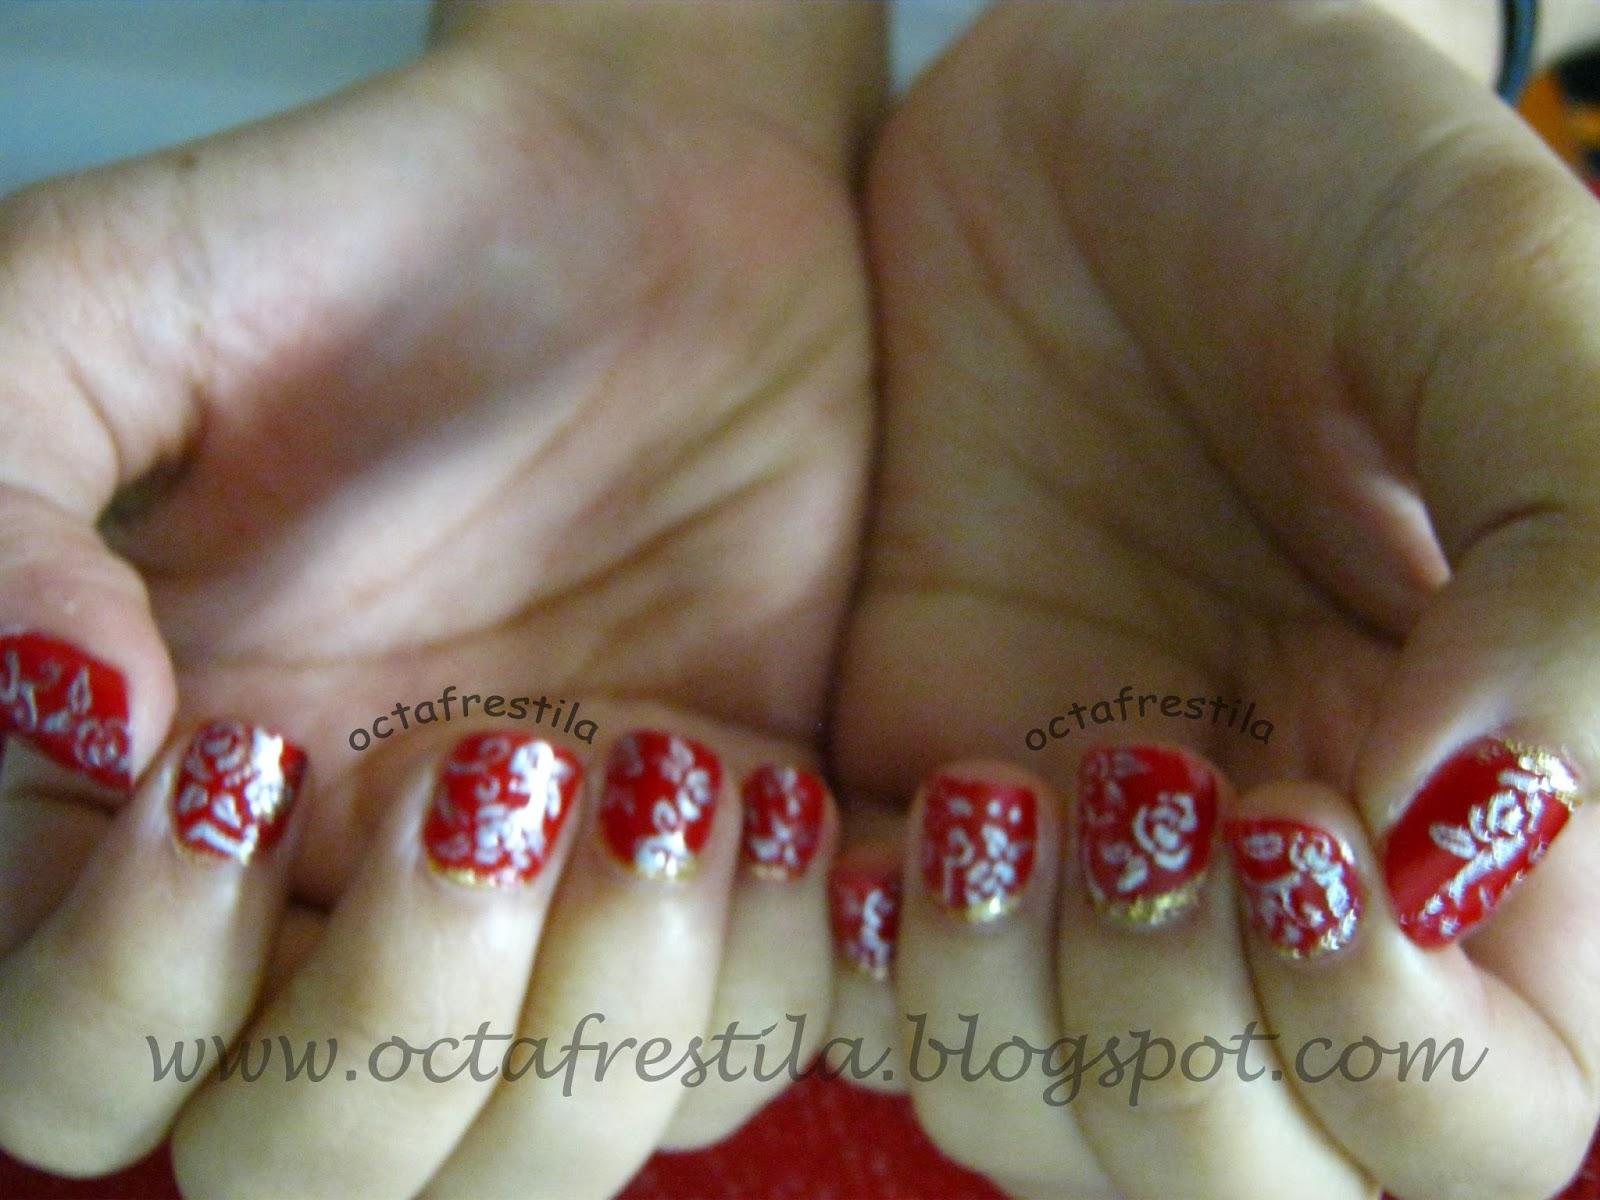 Octafrestila - Nail & Face ART: Red Silver Rose Nails (for tiny nails)